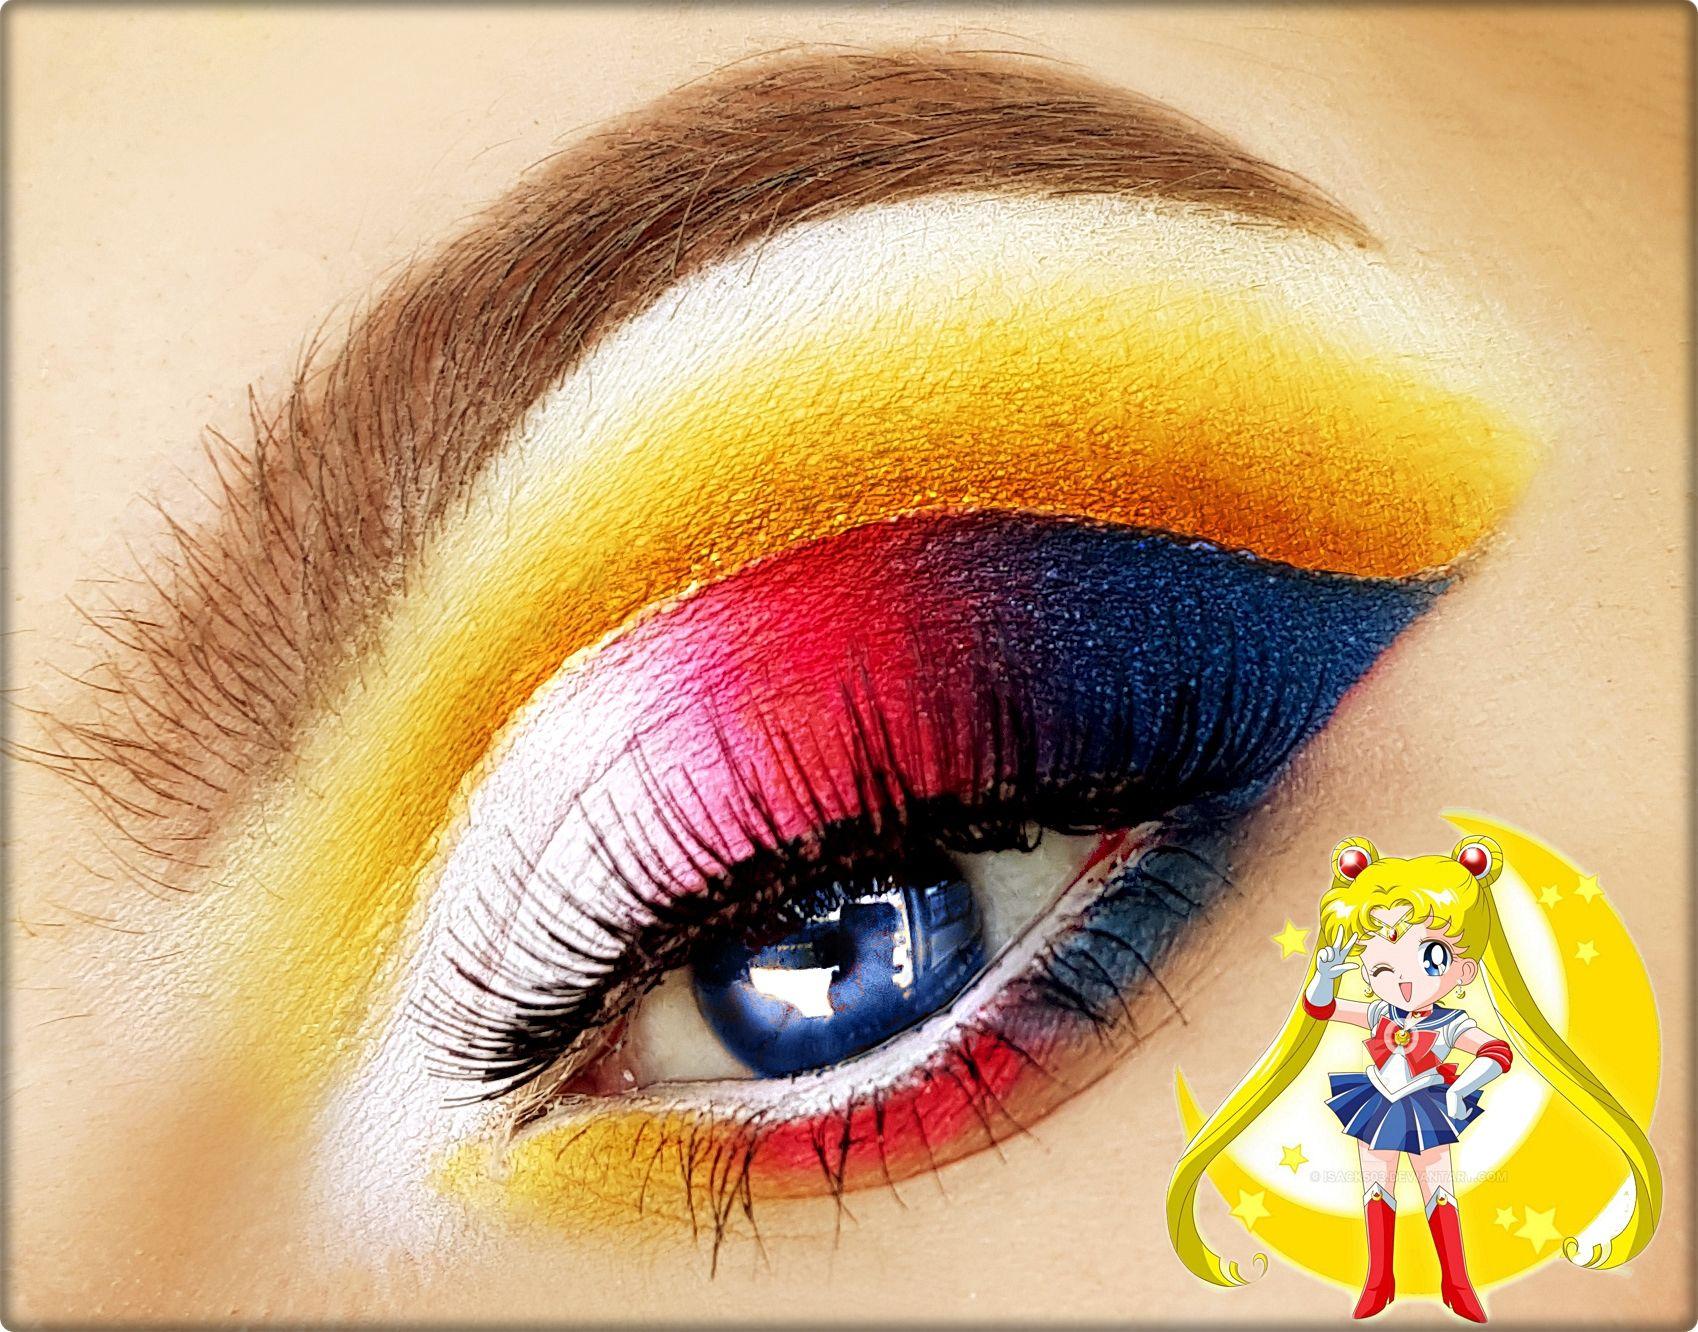 Sailor Moon Inspired Makeup Look In 2020 Sailor Moon Makeup Makeup Sailor Moon